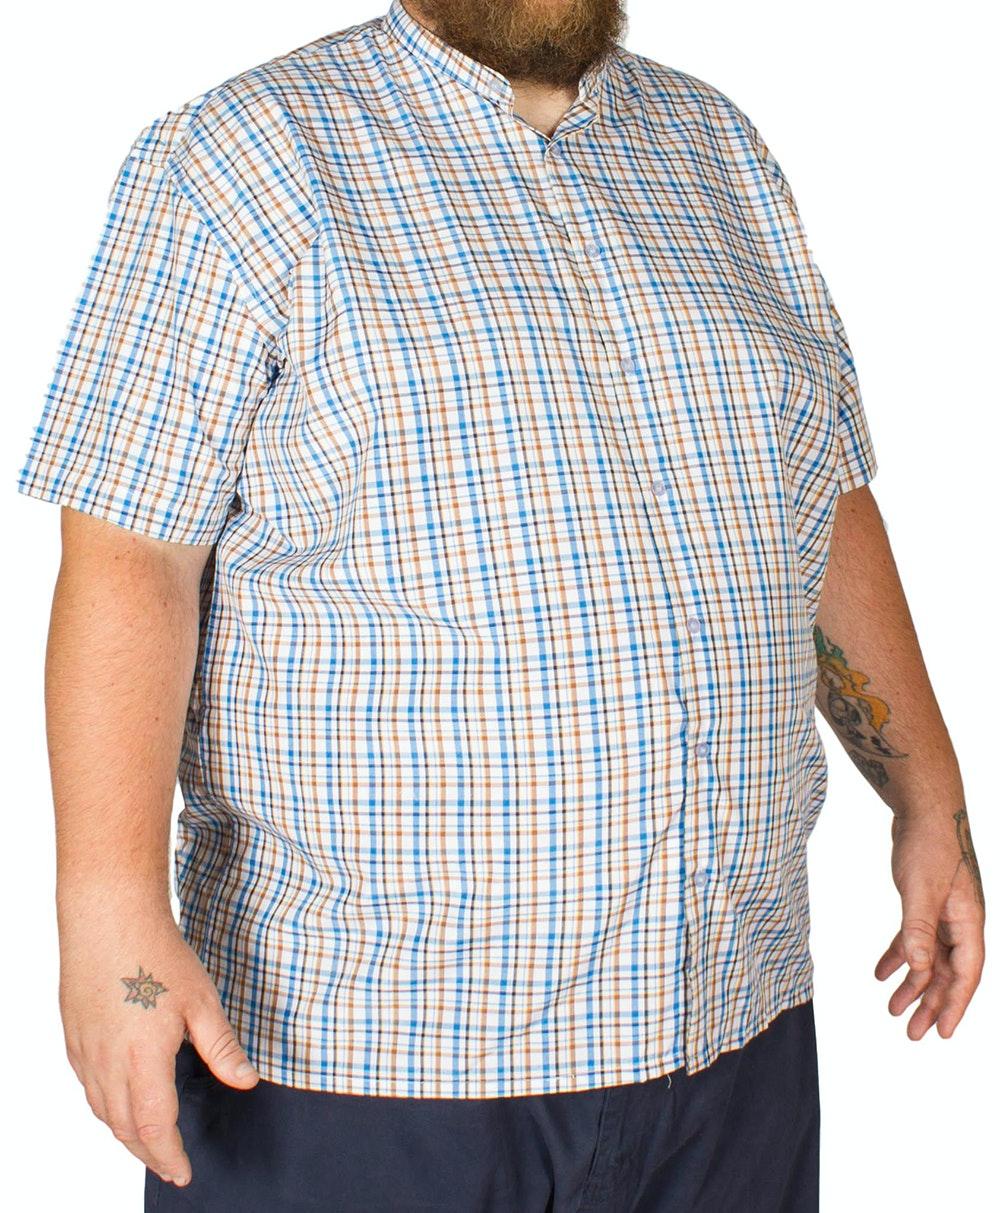 Fitzgerald Grandad Check Shirt Blue